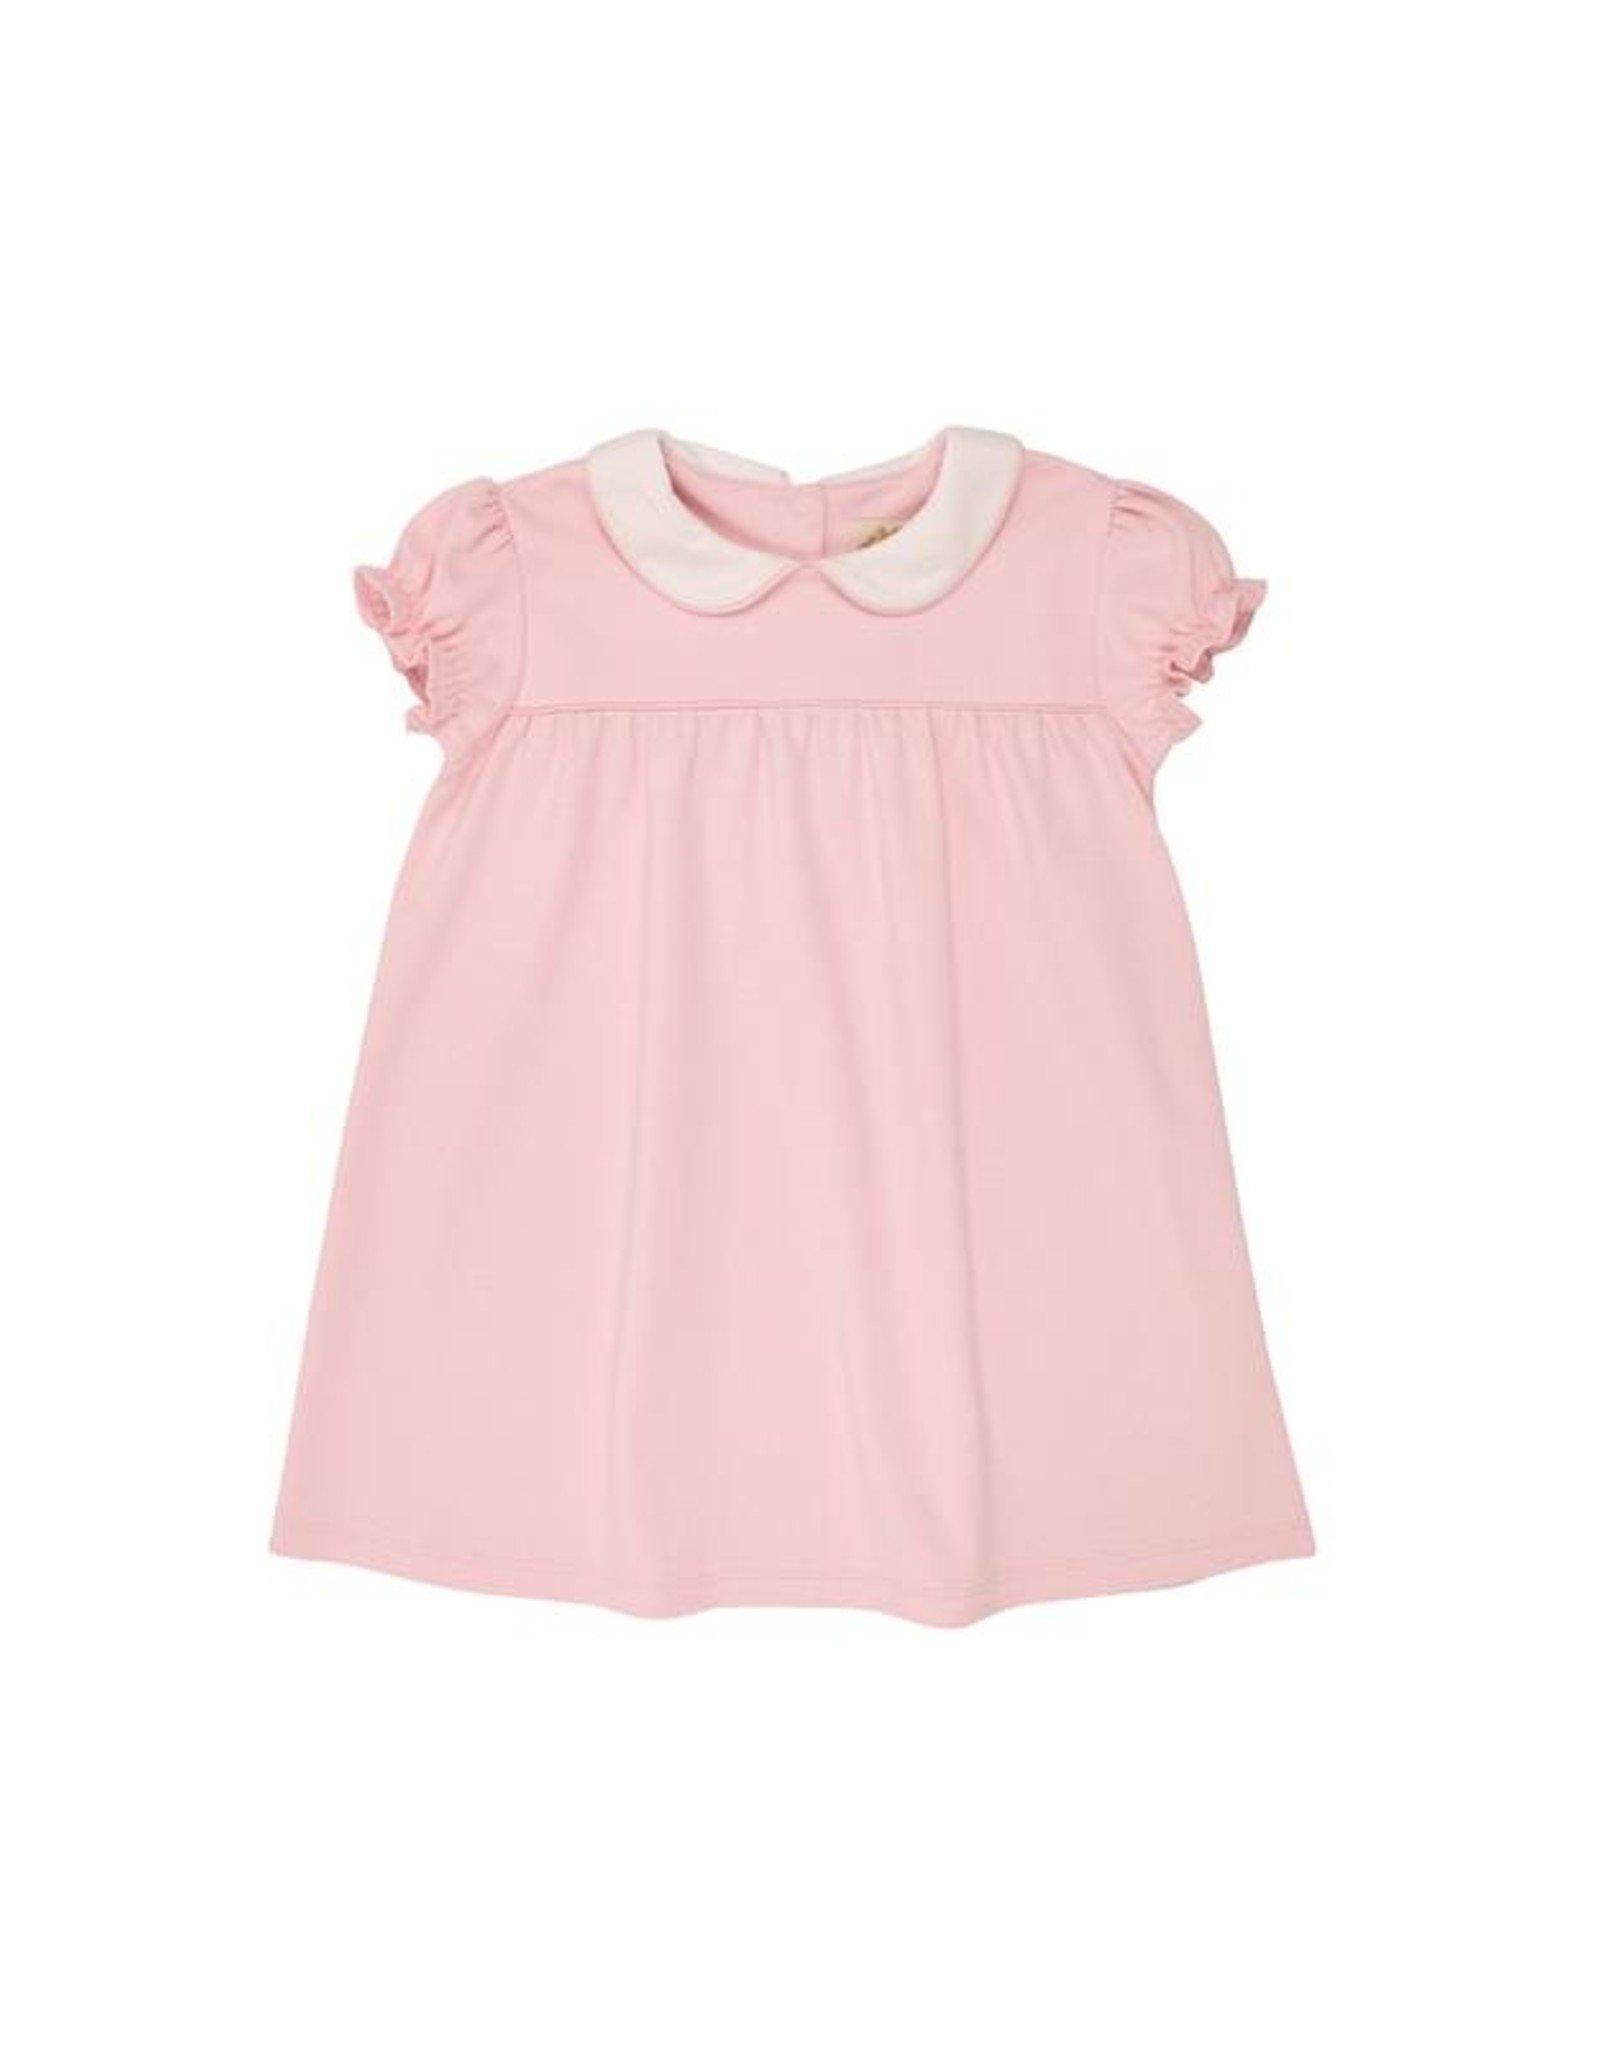 The Beaufort Bonnet Company Holly Day Pima Dress, Palm Beach Pink